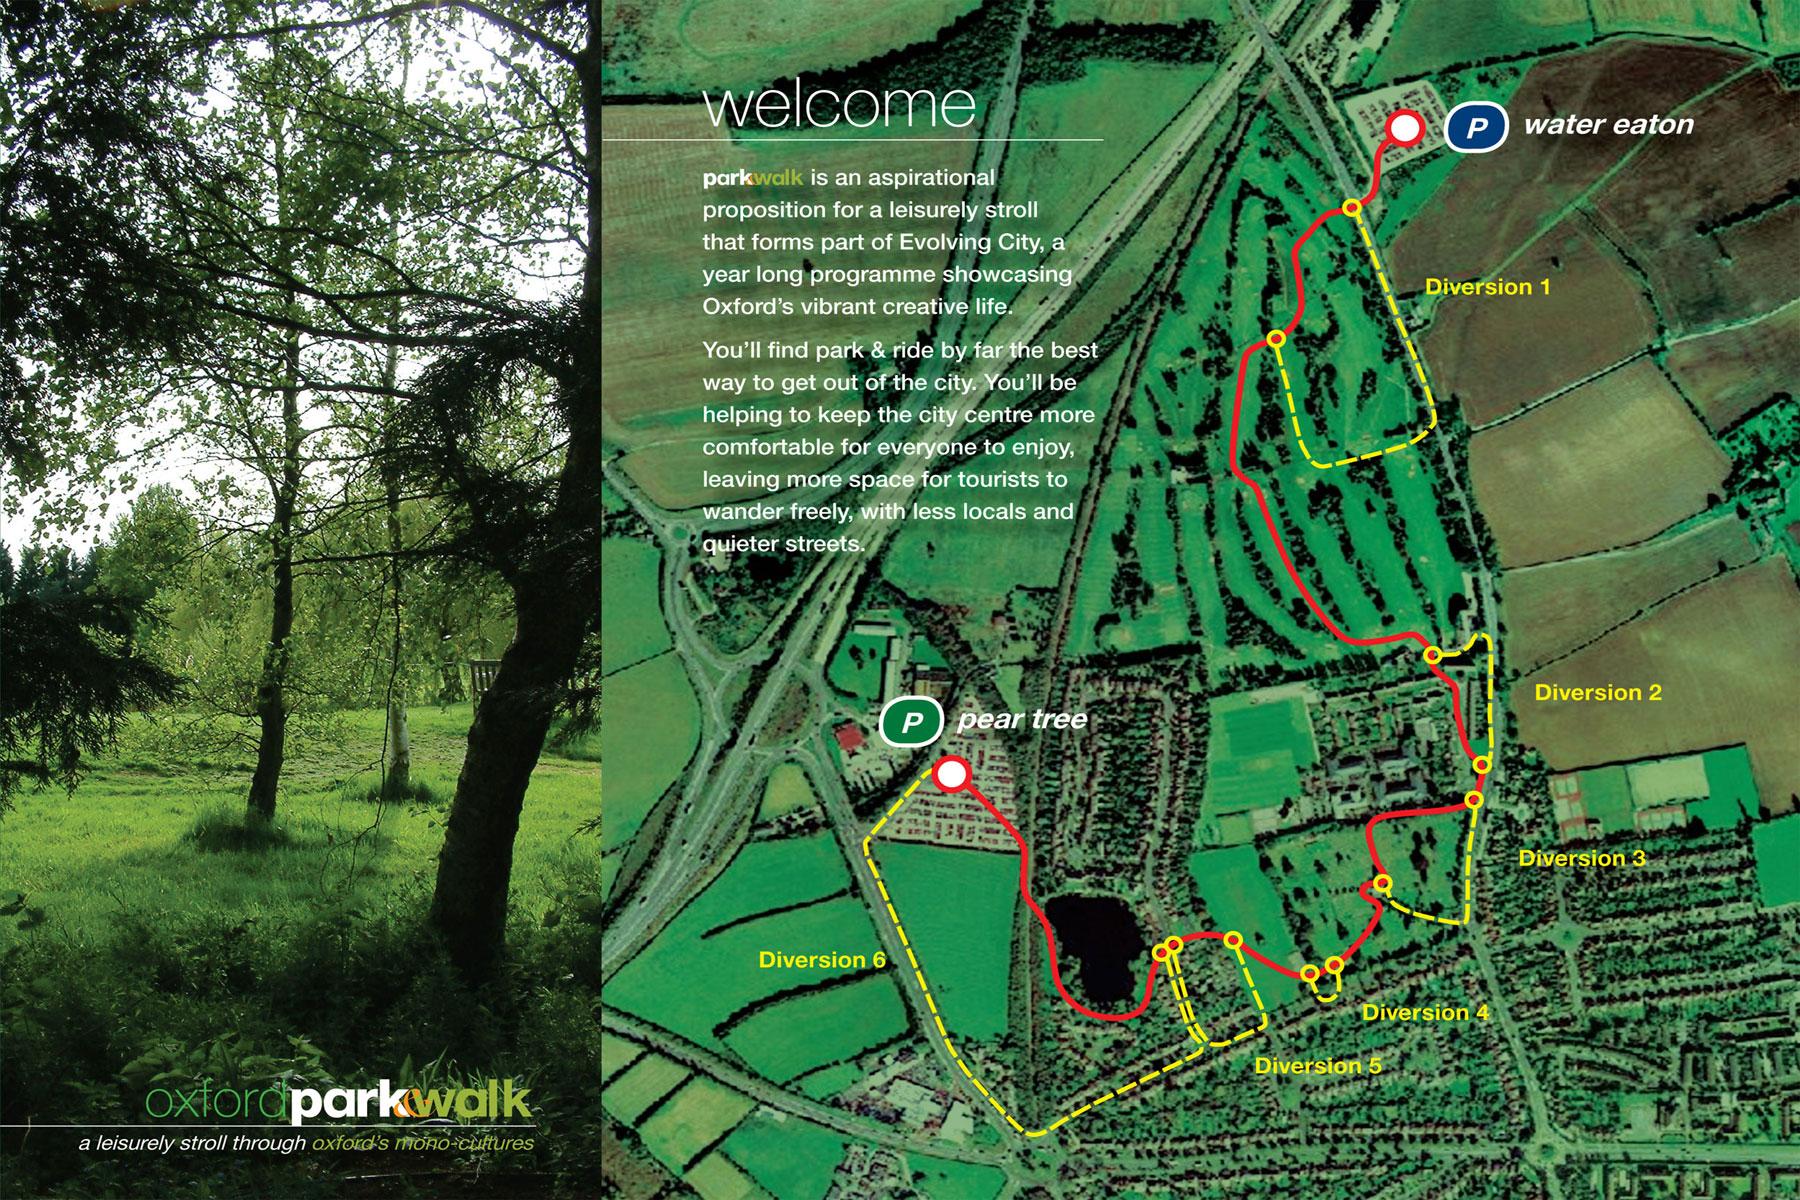 Park&walk1